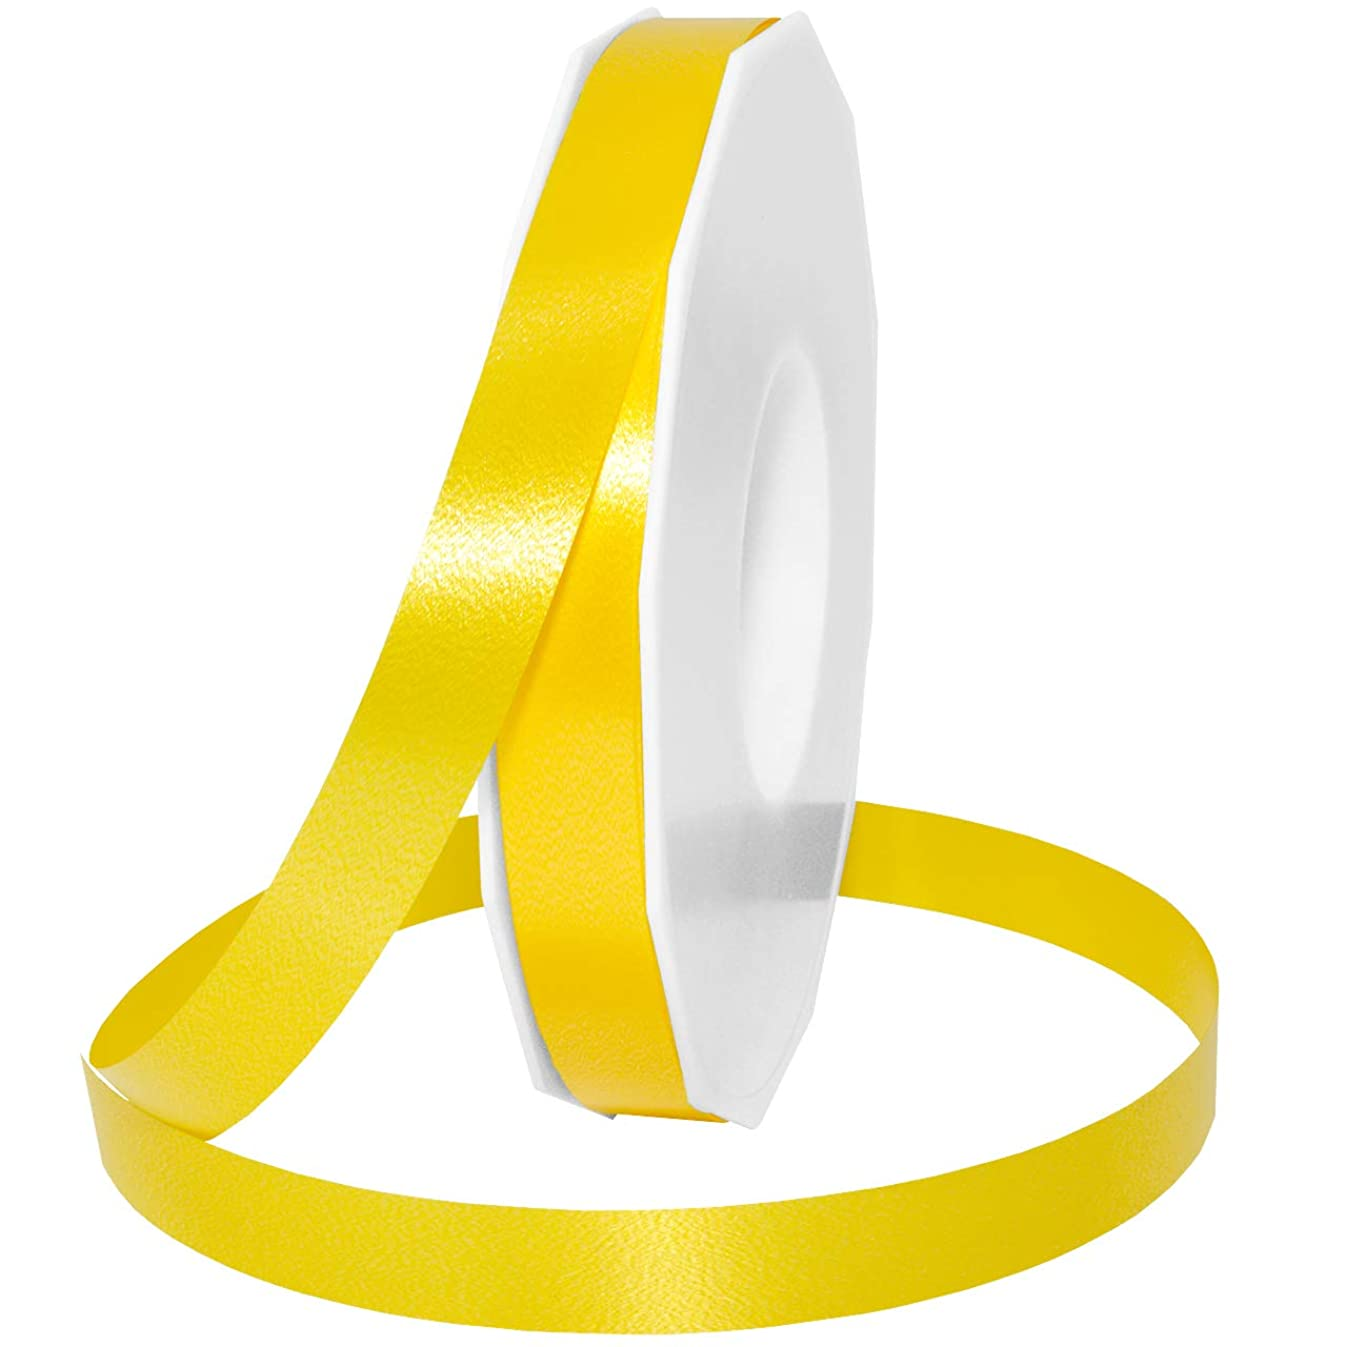 Morex Ribbon Style 187 Ribbon, 5/8 inch by 100 Yards, Yellow